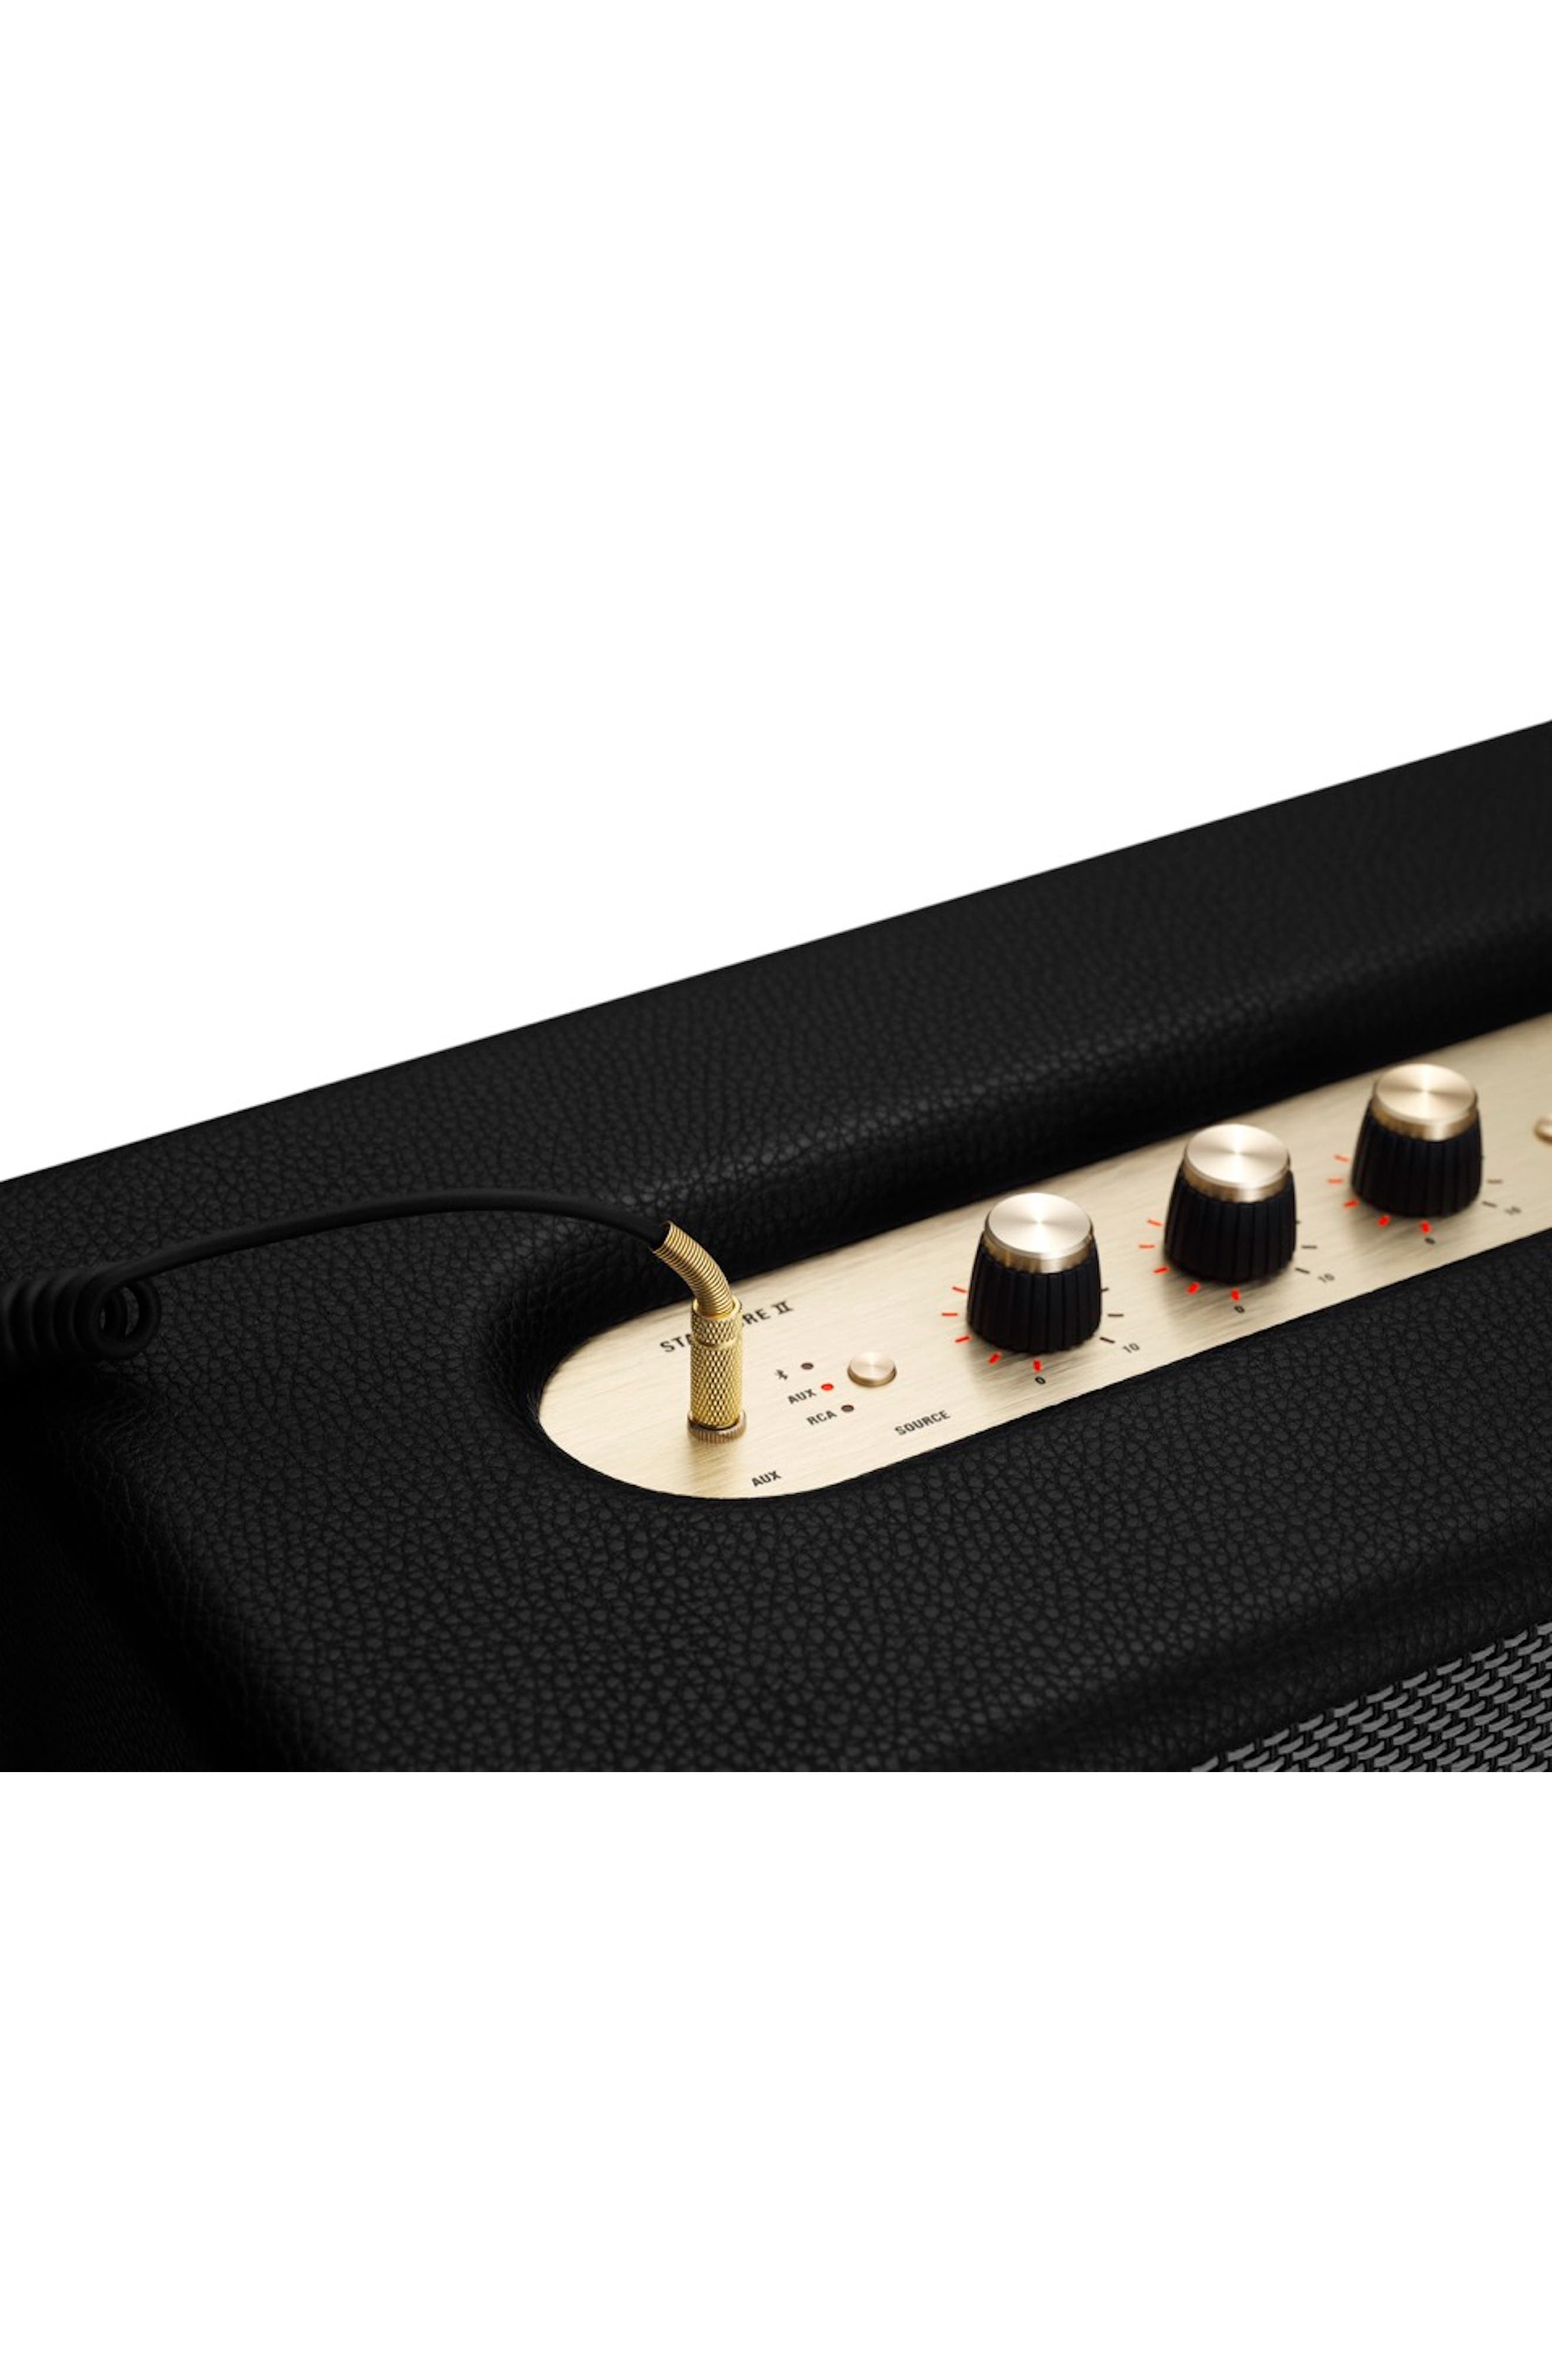 MARSHALL,                             Stanmore II Bluetooth<sup>®</sup> Speaker,                             Alternate thumbnail 4, color,                             BLACK